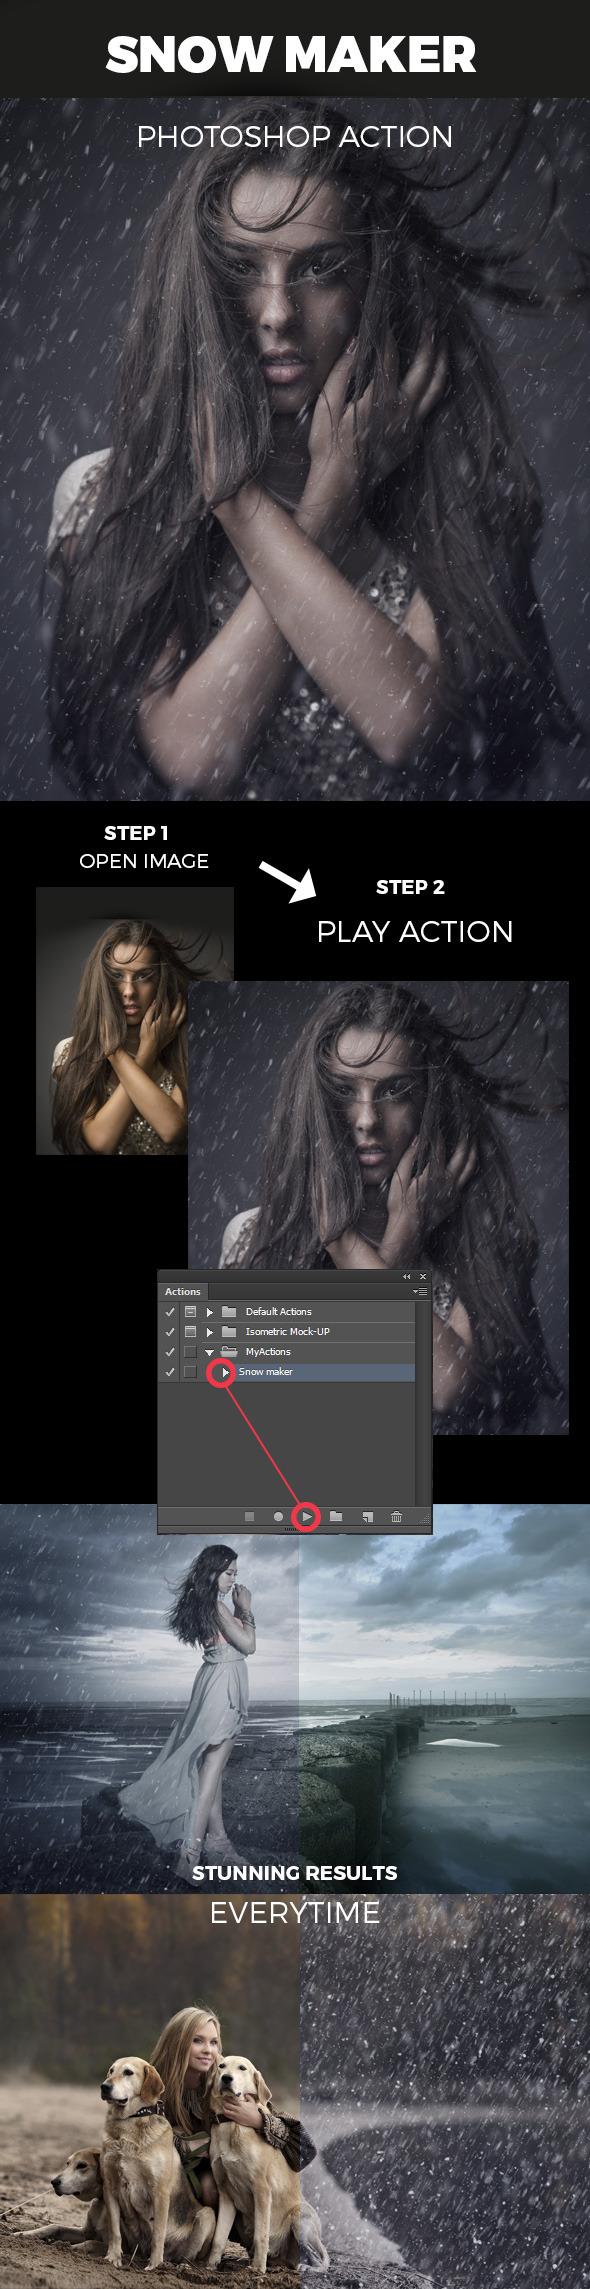 GraphicRiver Snow Maker Photoshop Action 11400035